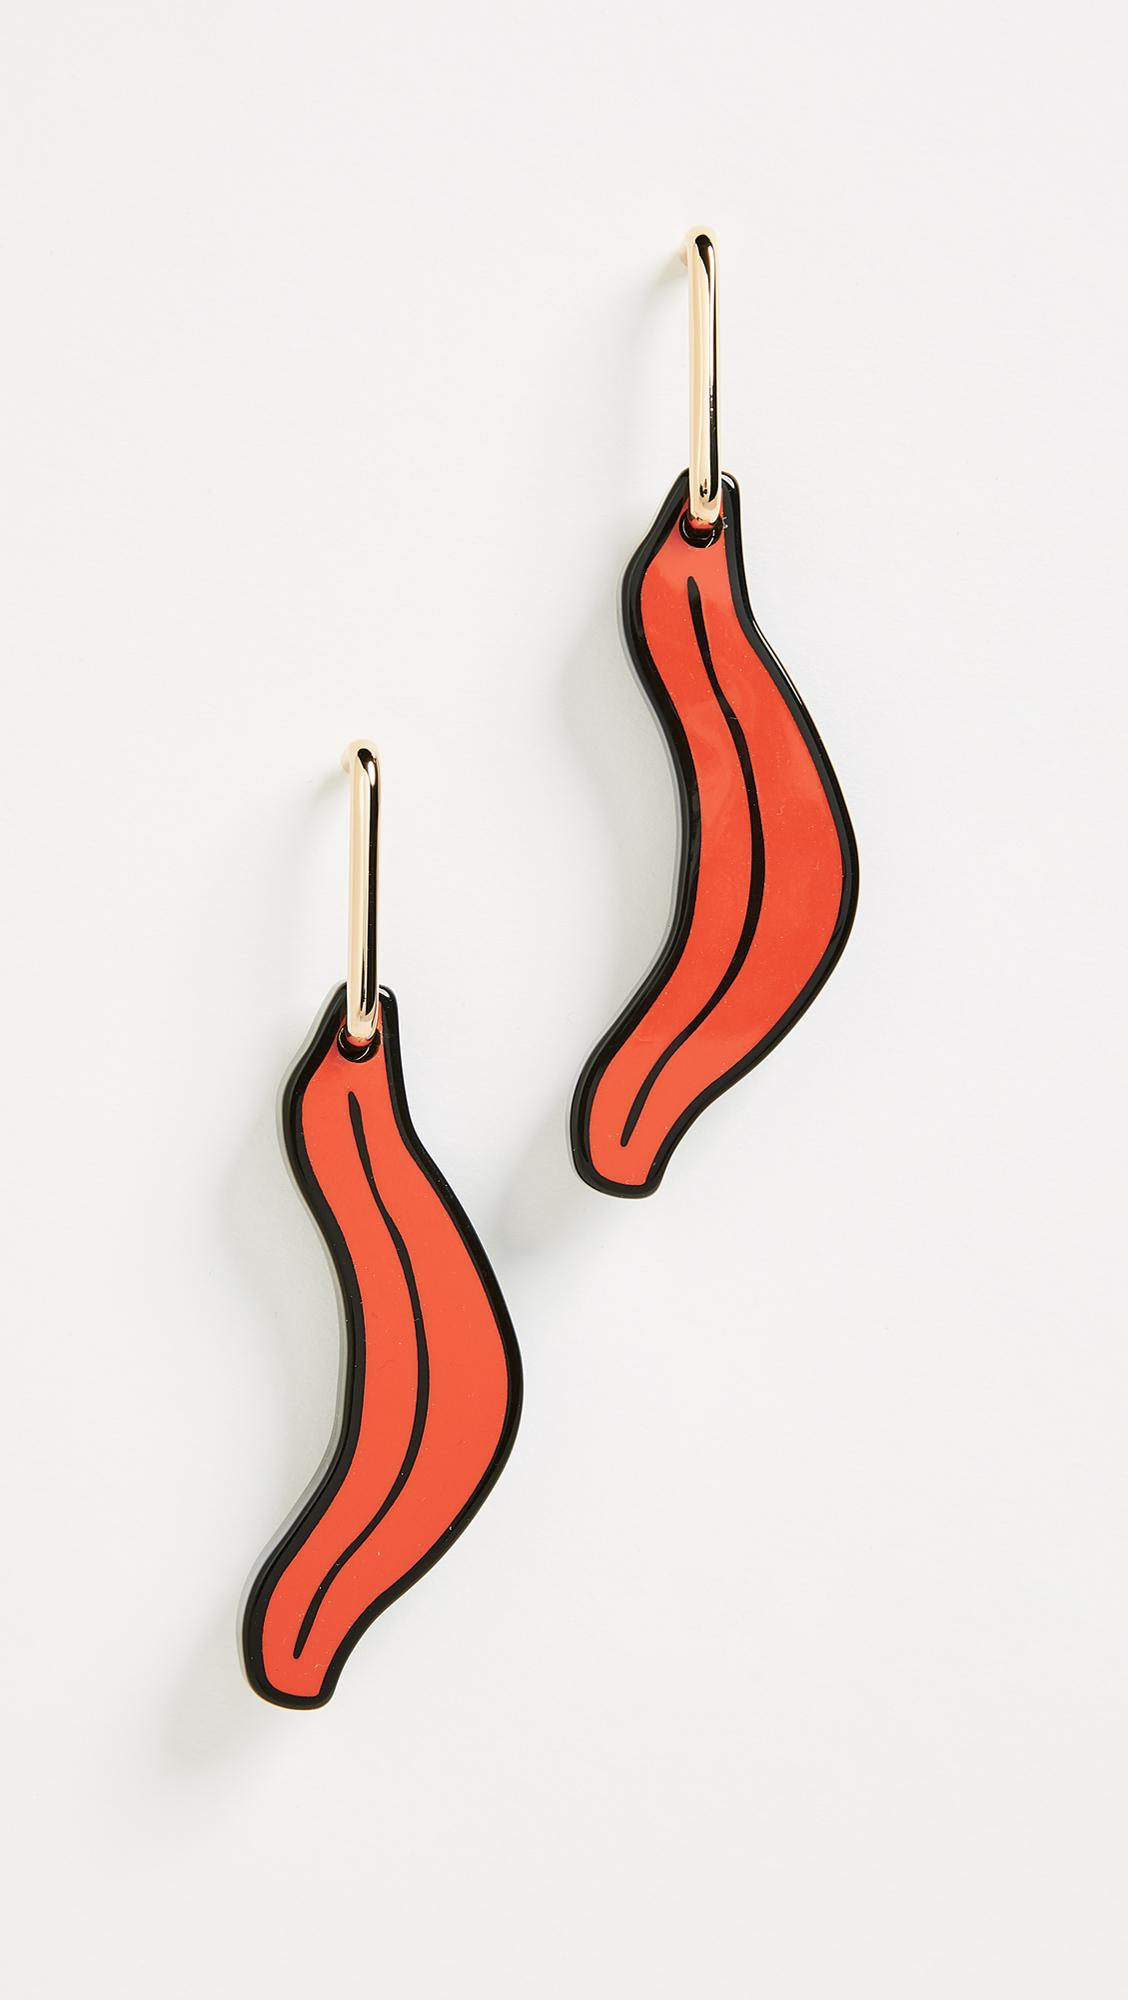 Marni Petal in Resin Earrings oCdEKau